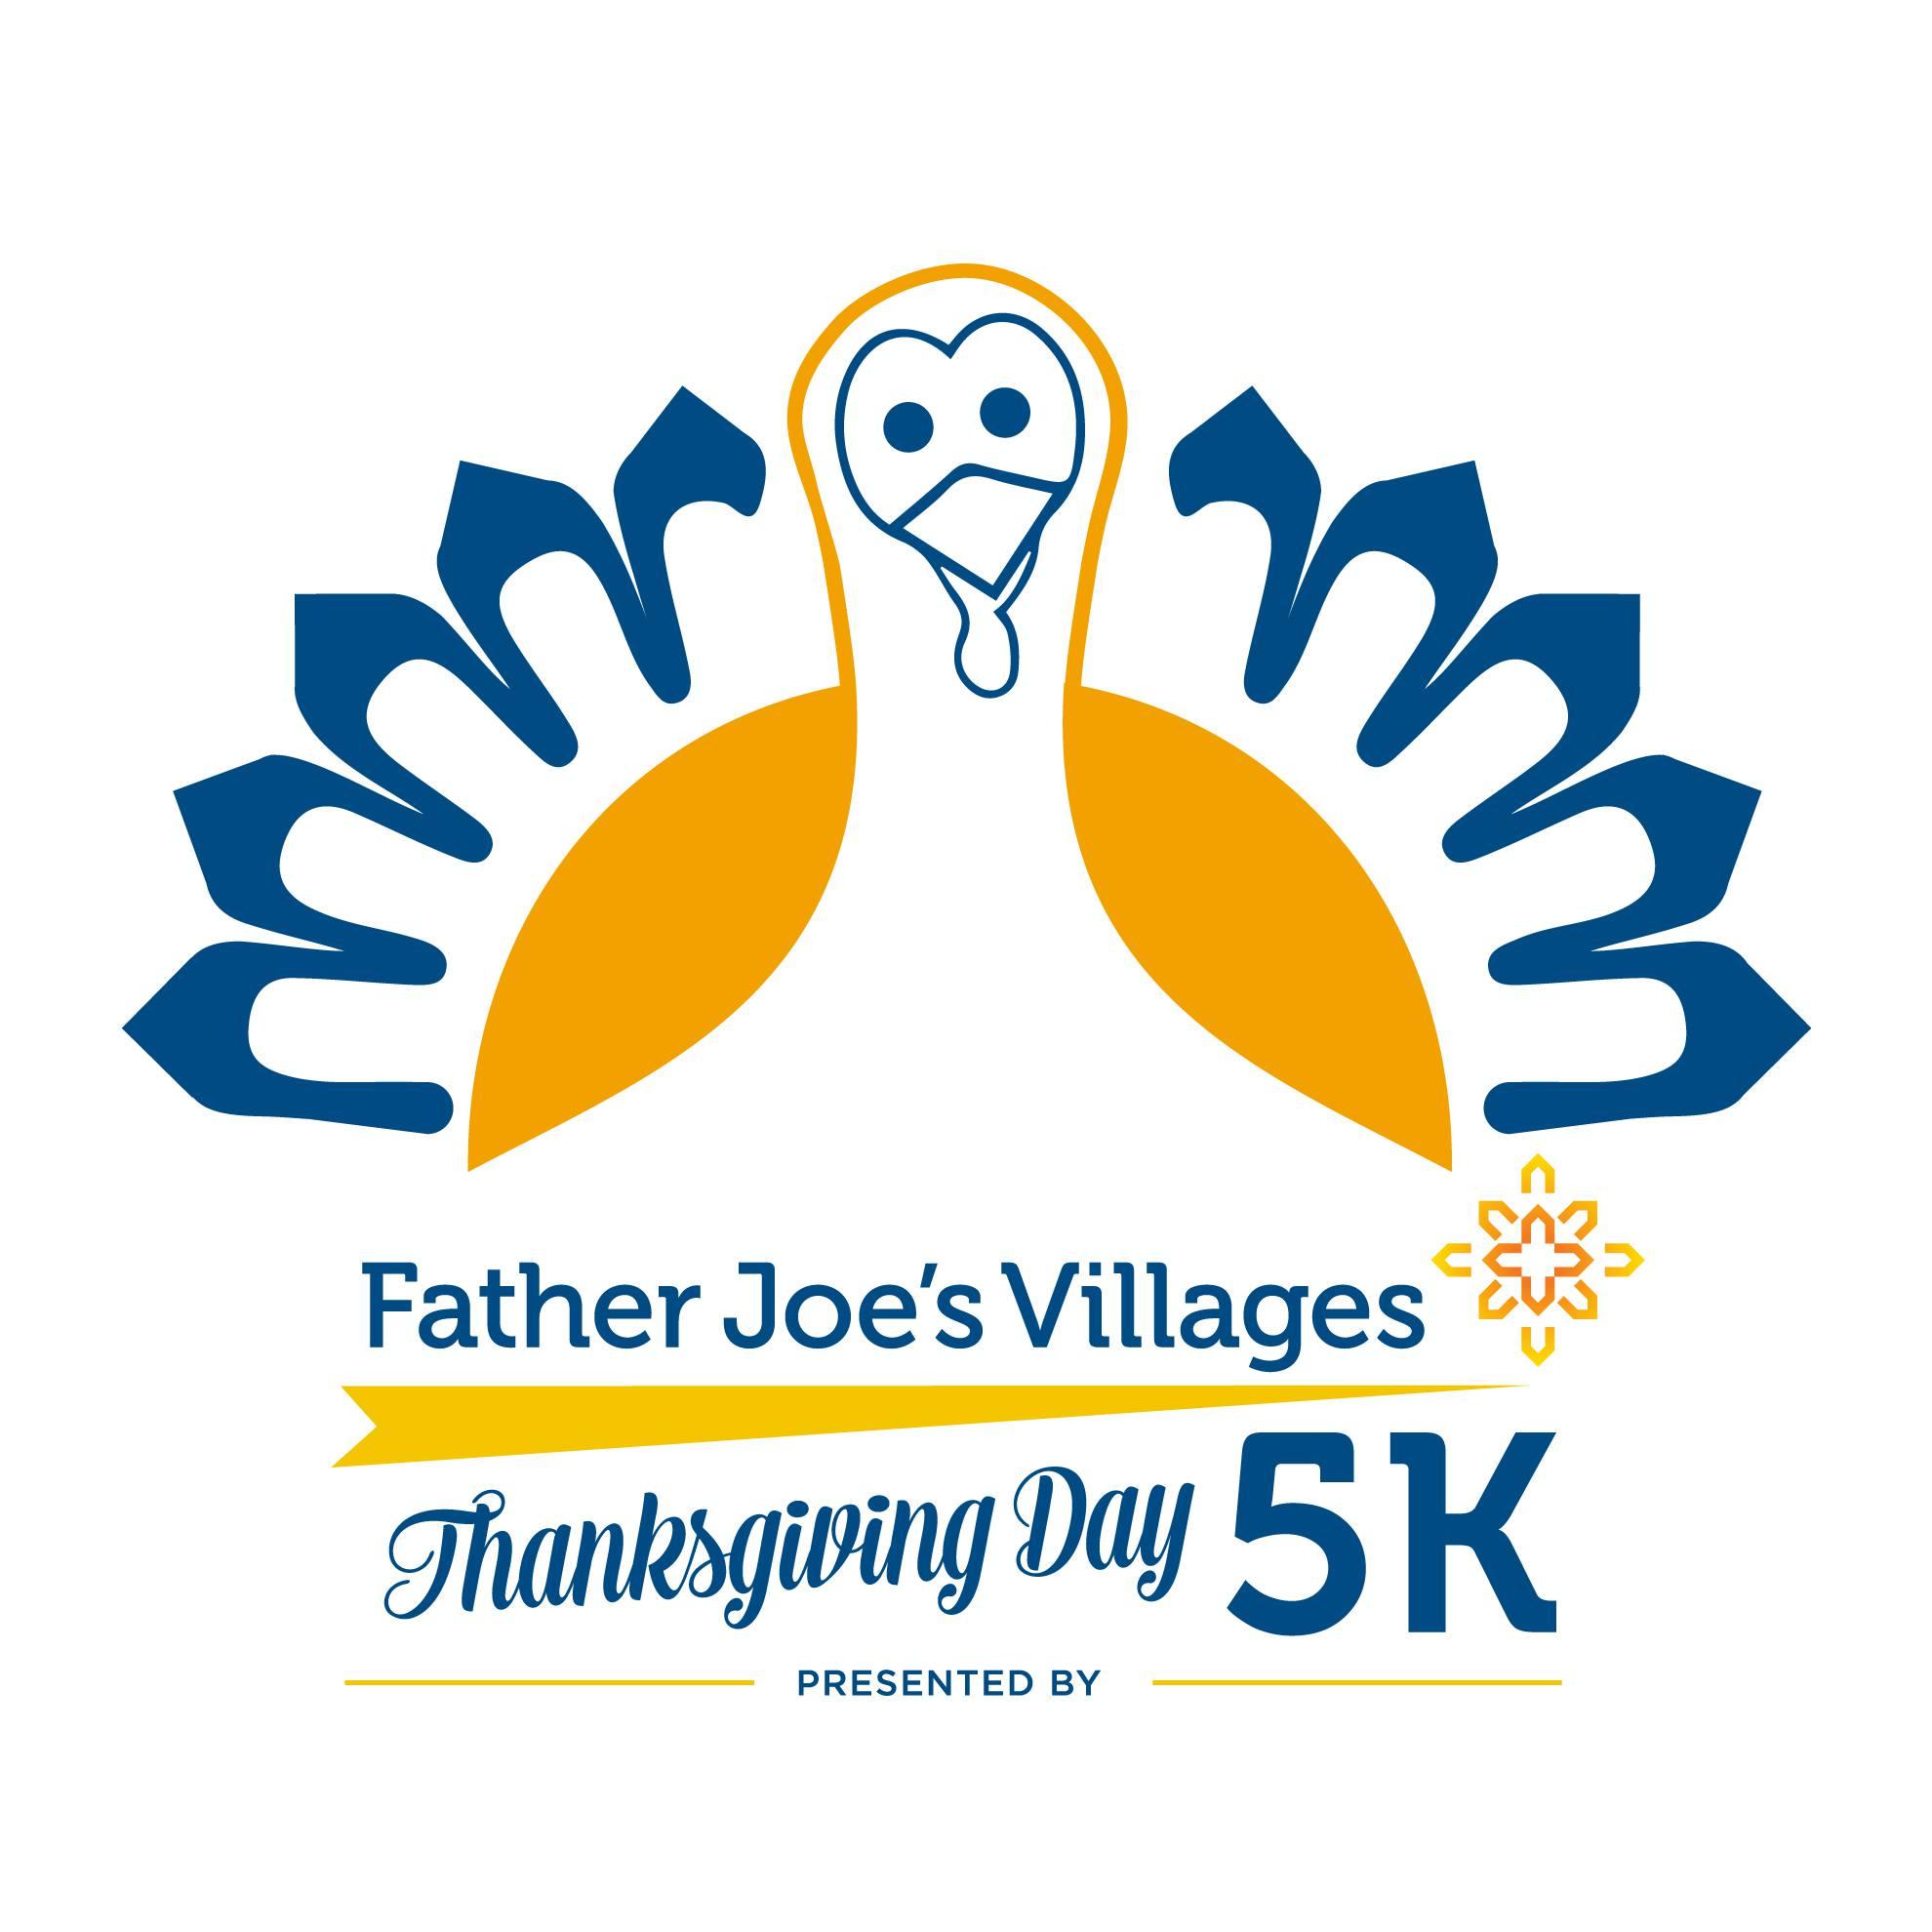 November 26: 14th Annual Father Joe's Villages Thanksgiving Day 5K Run & Walk